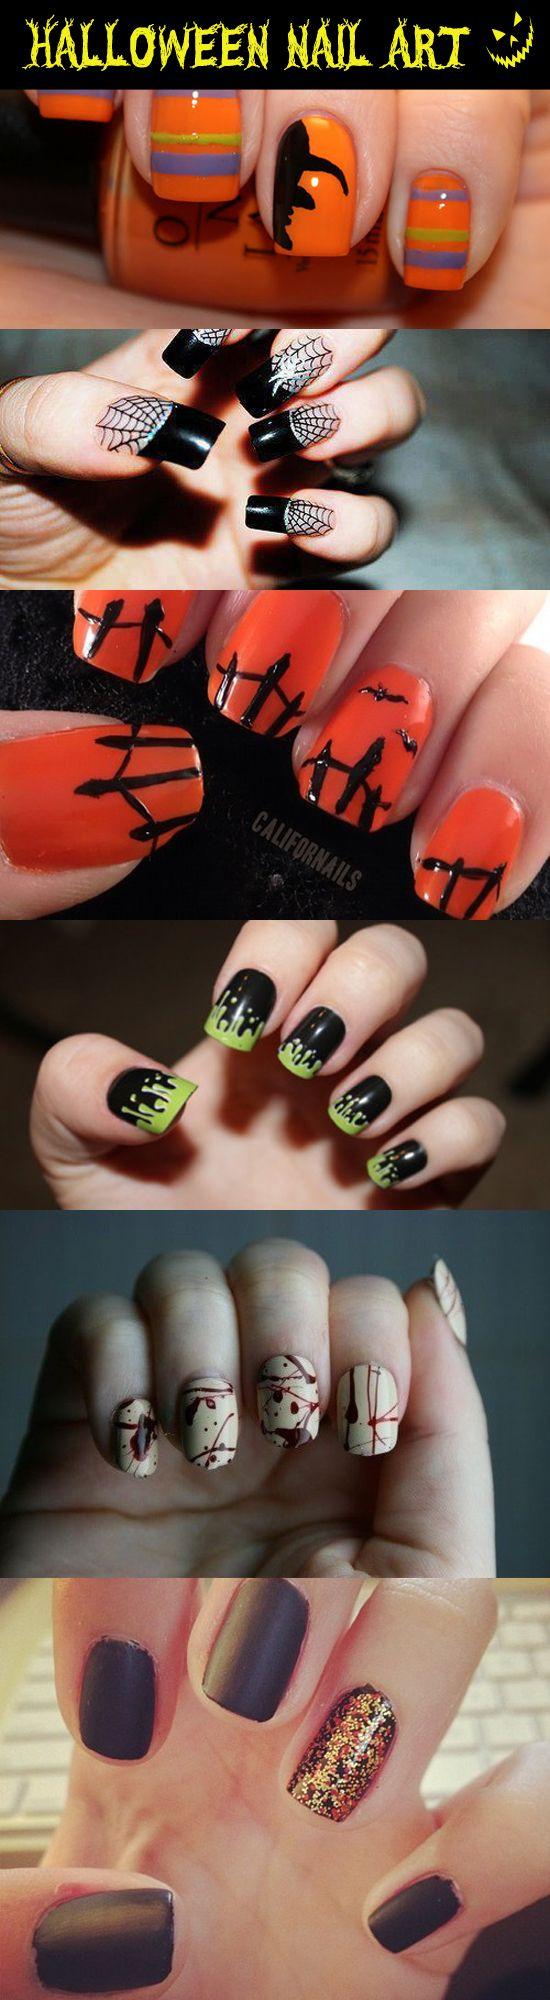 Mejores 83 imgenes de clawz en pinterest uas bonitas diseos de halloween nail art ideas unique halloween nails nail art designs 2012 online fashion solutioingenieria Image collections